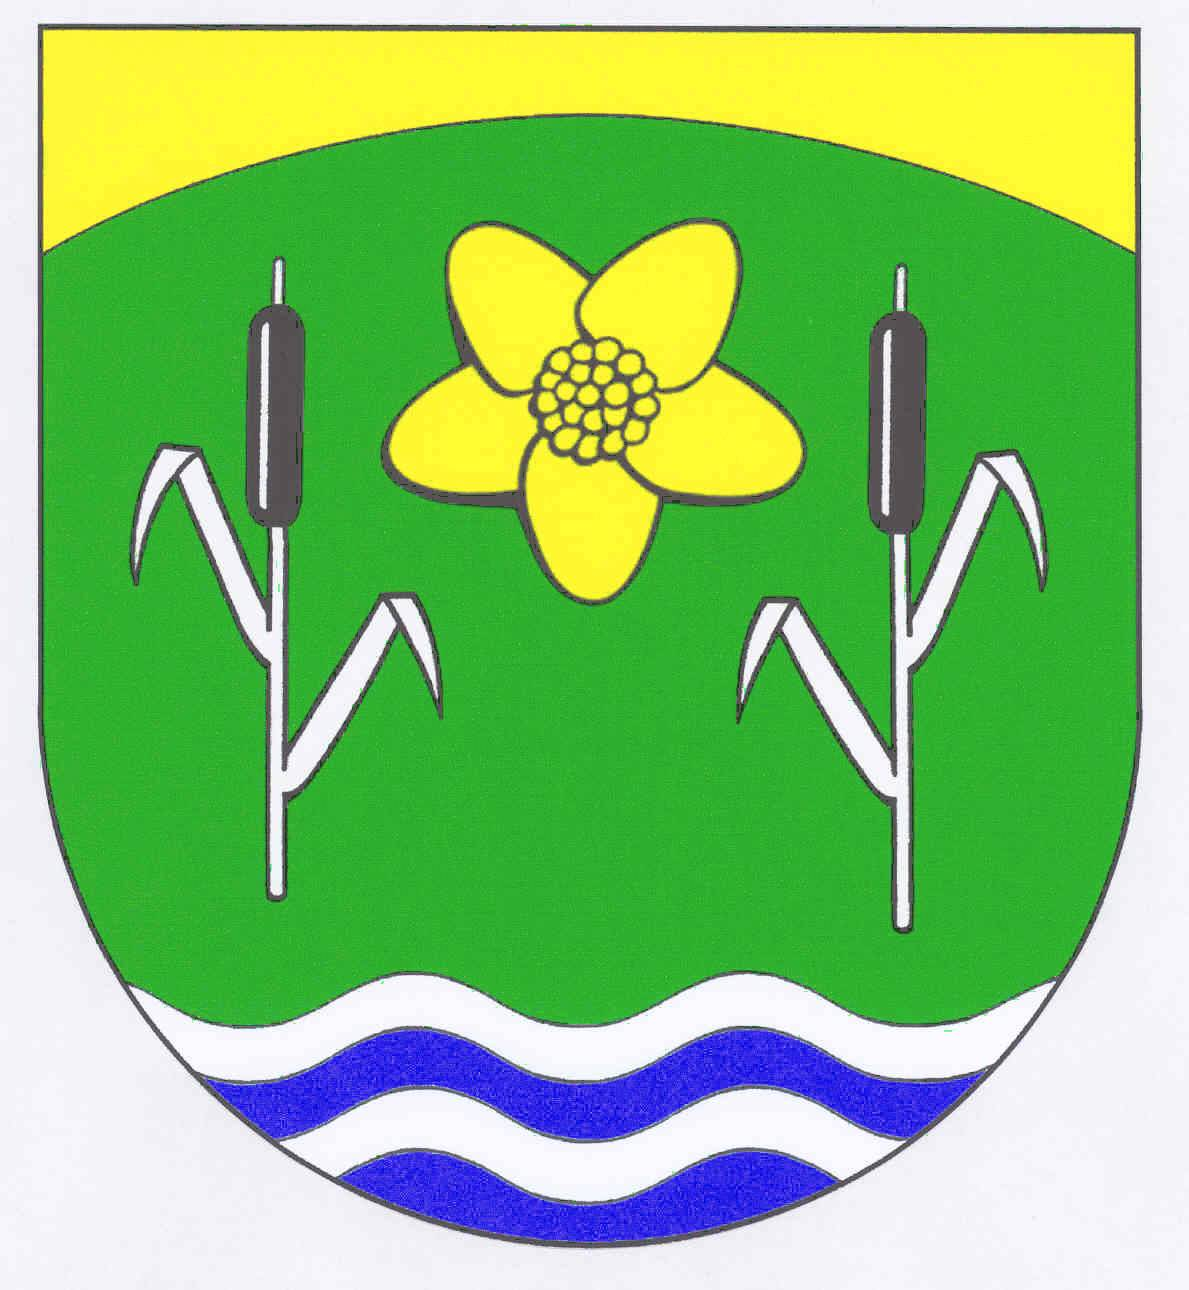 Wappen GemeindeBebensee, Kreis Segeberg